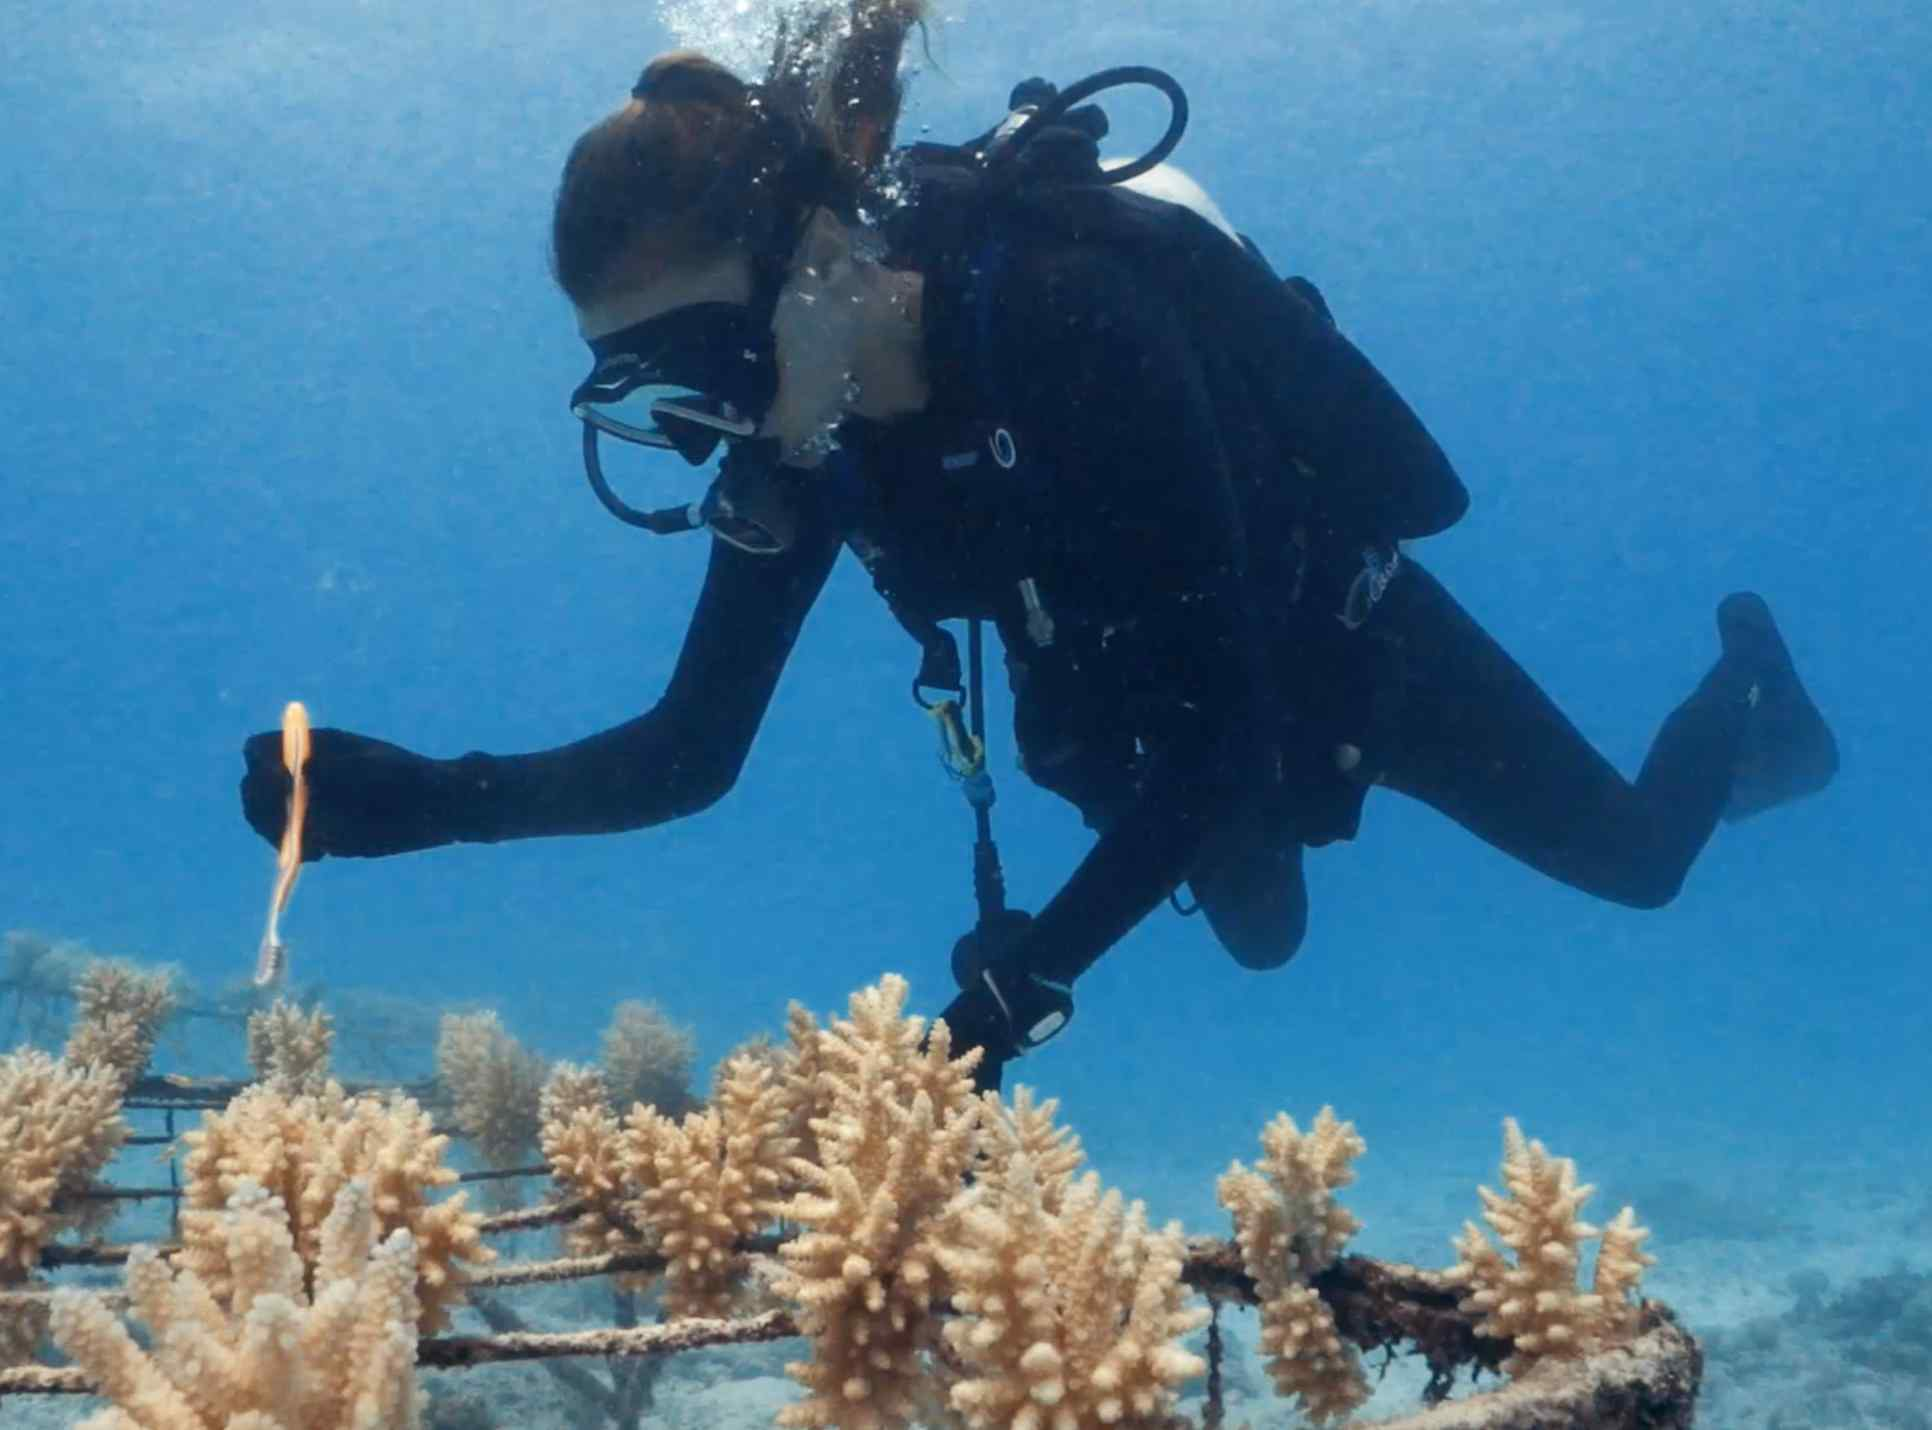 Replnater des coraux